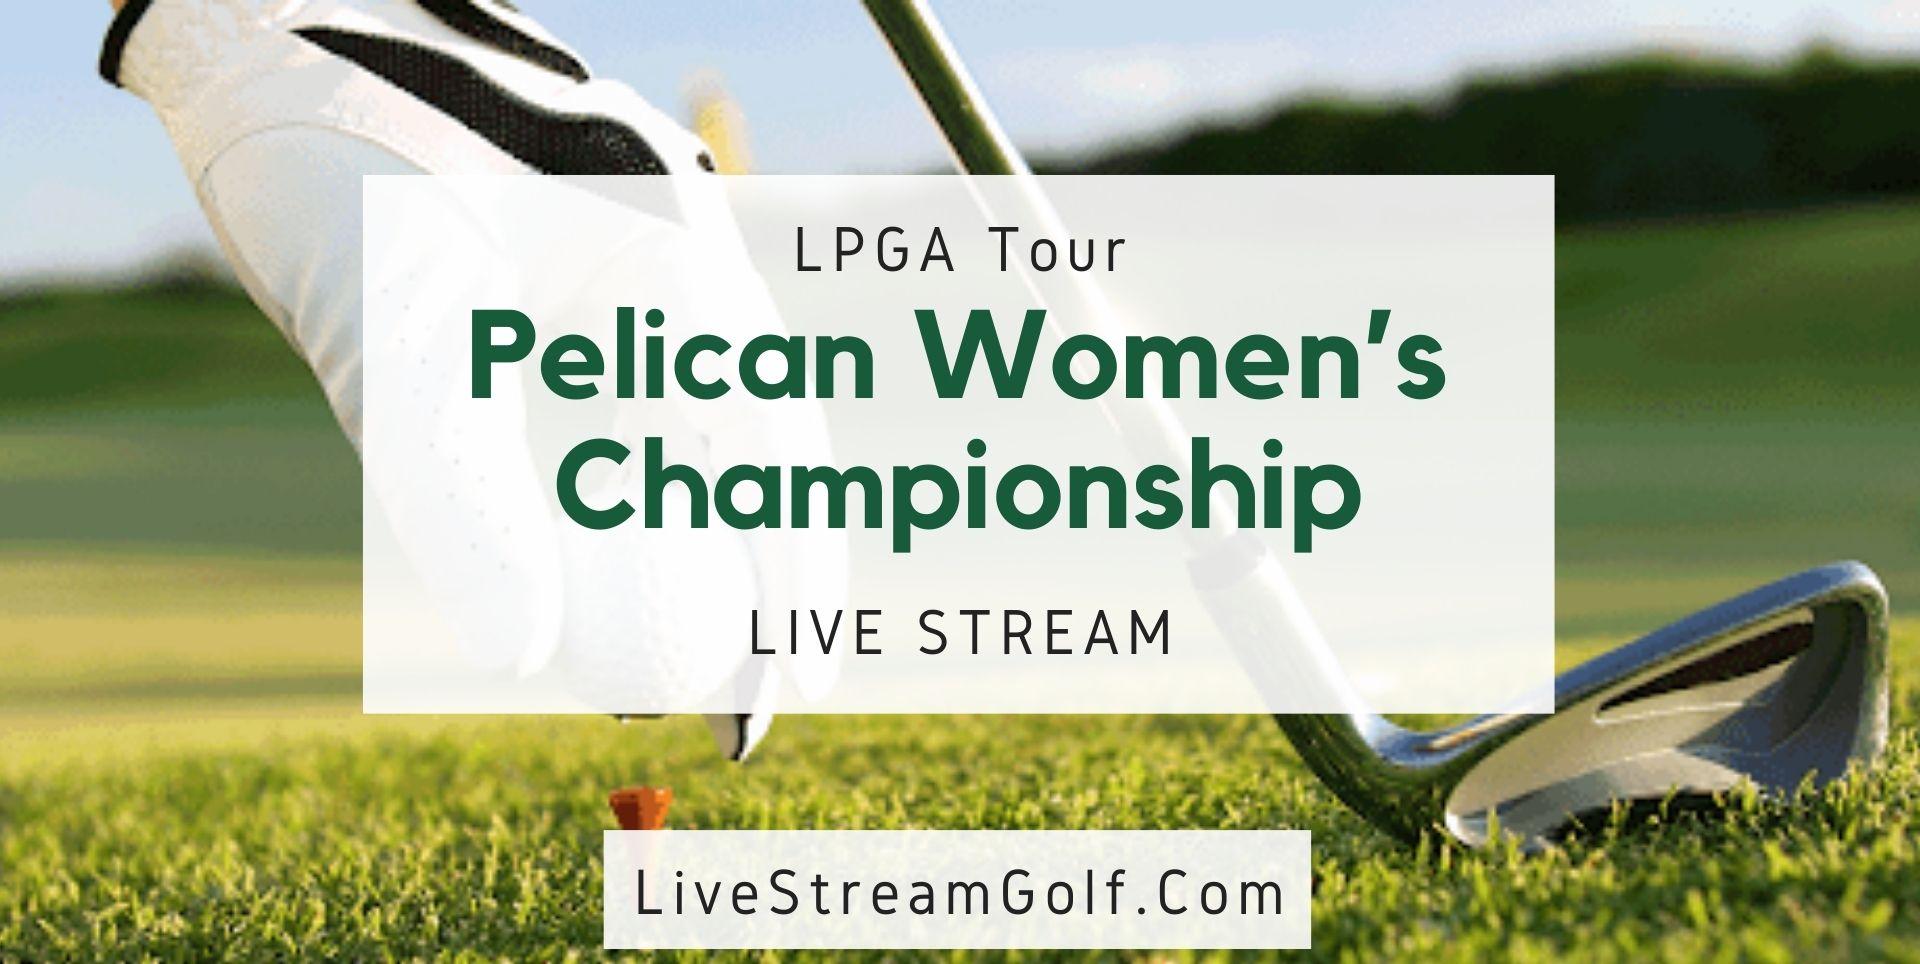 Pelican Women's Championship Rd 4 Live Stream: LPGA 2021